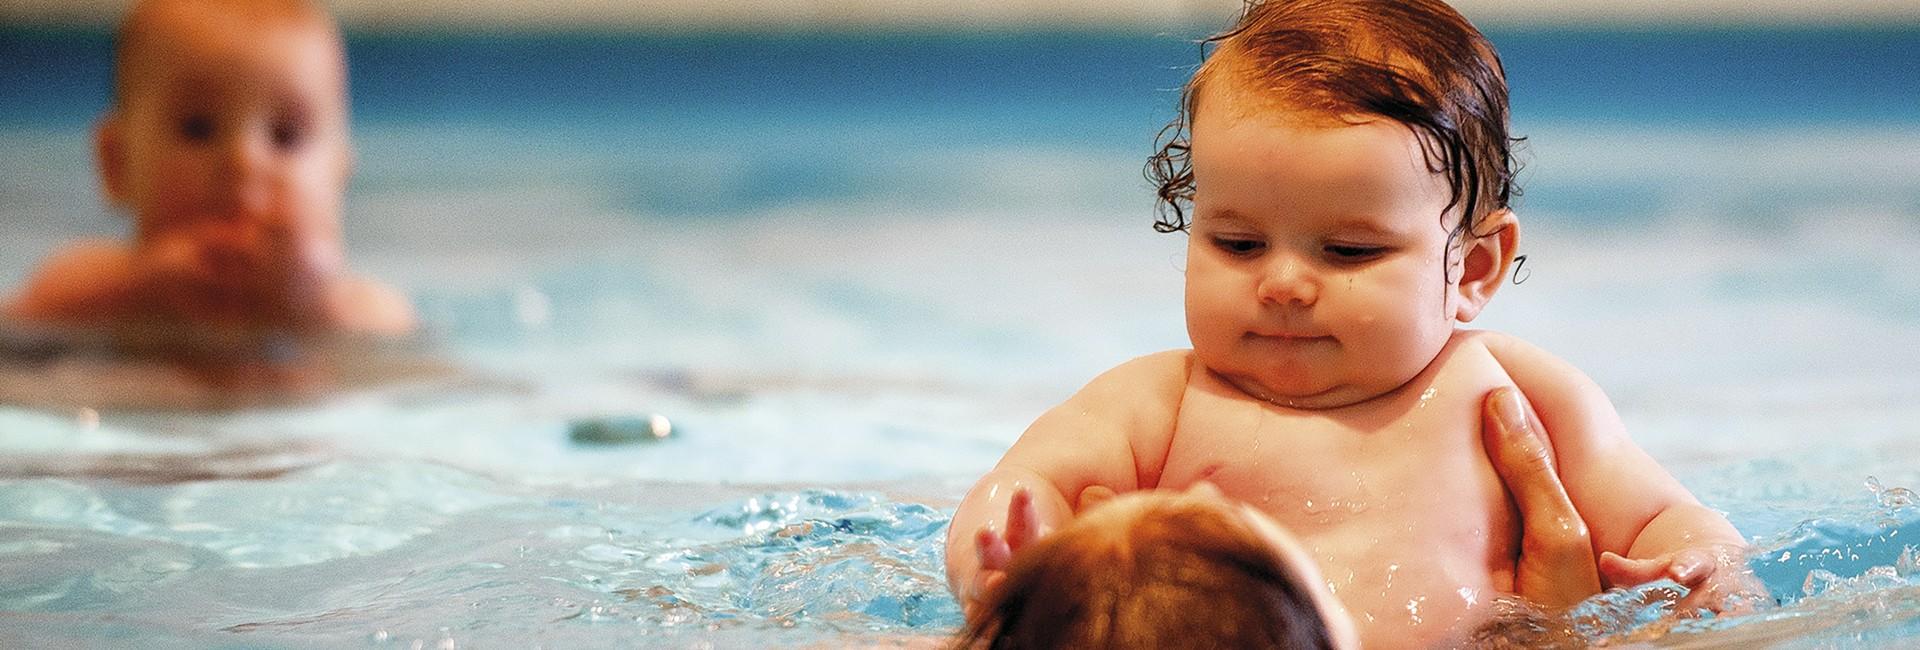 Van babyzwemmen tot therapiezwemmen